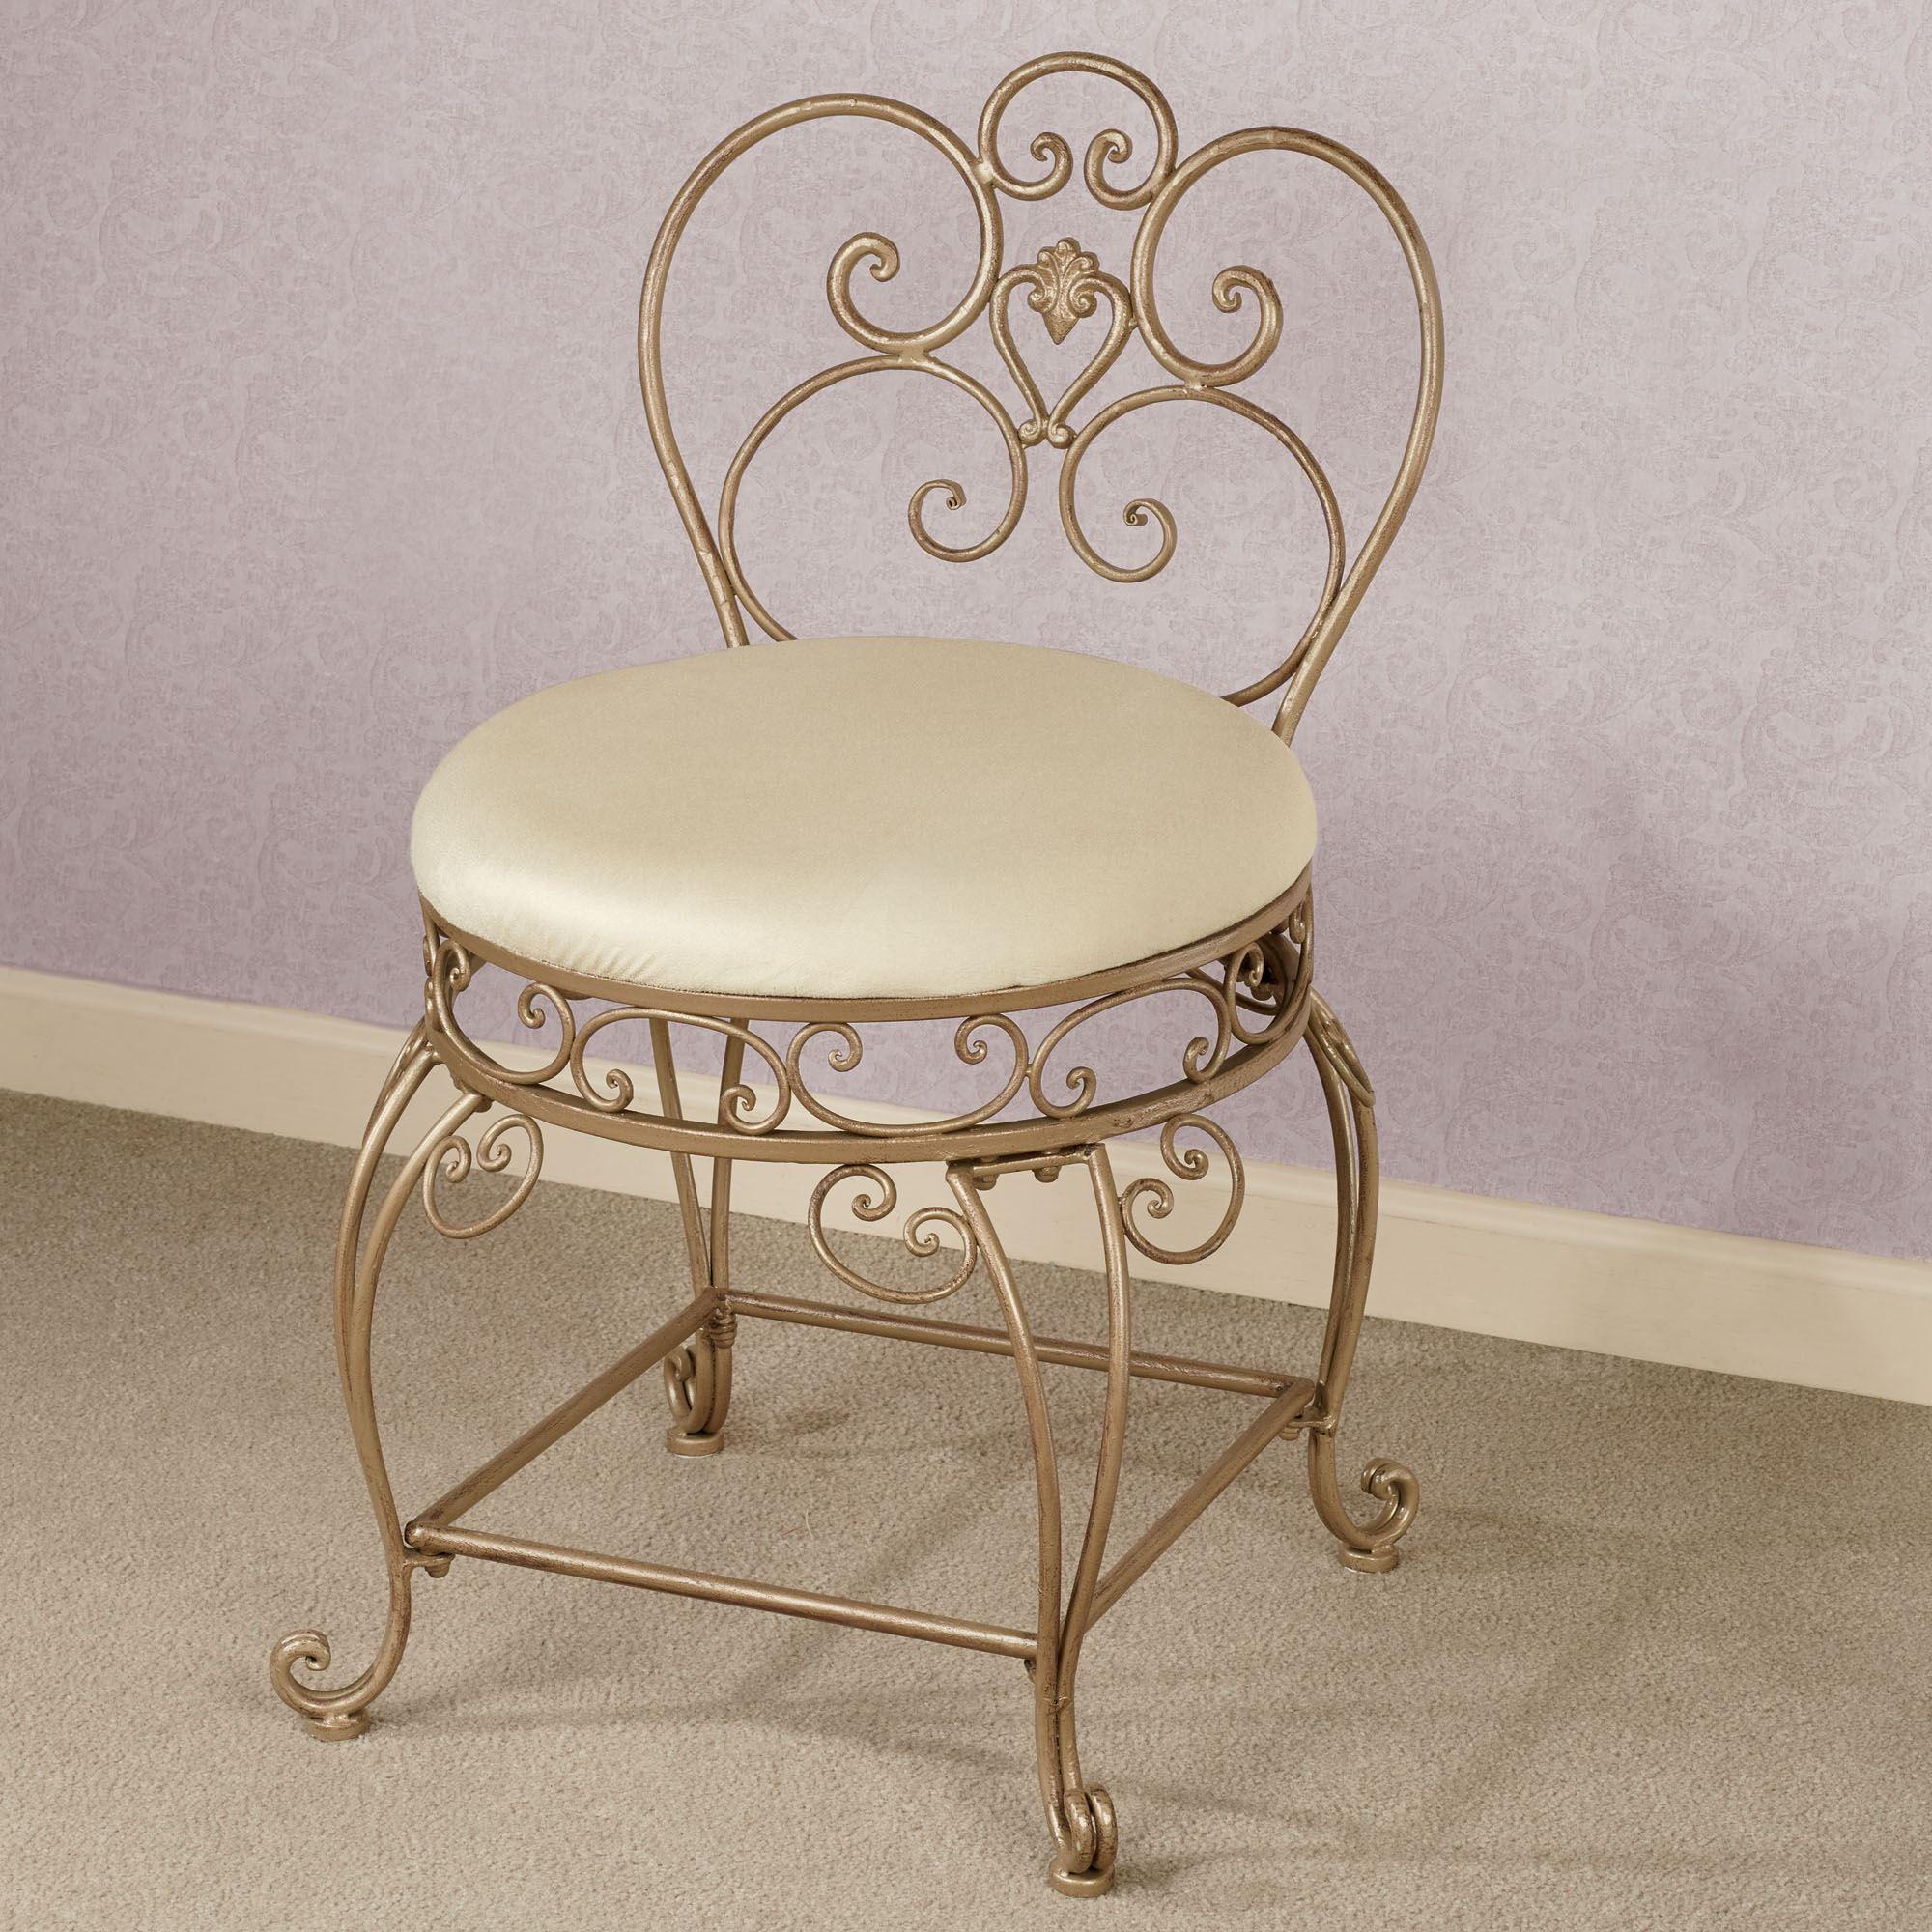 Aldabella Satin Gold Upholstered Vanity Chair